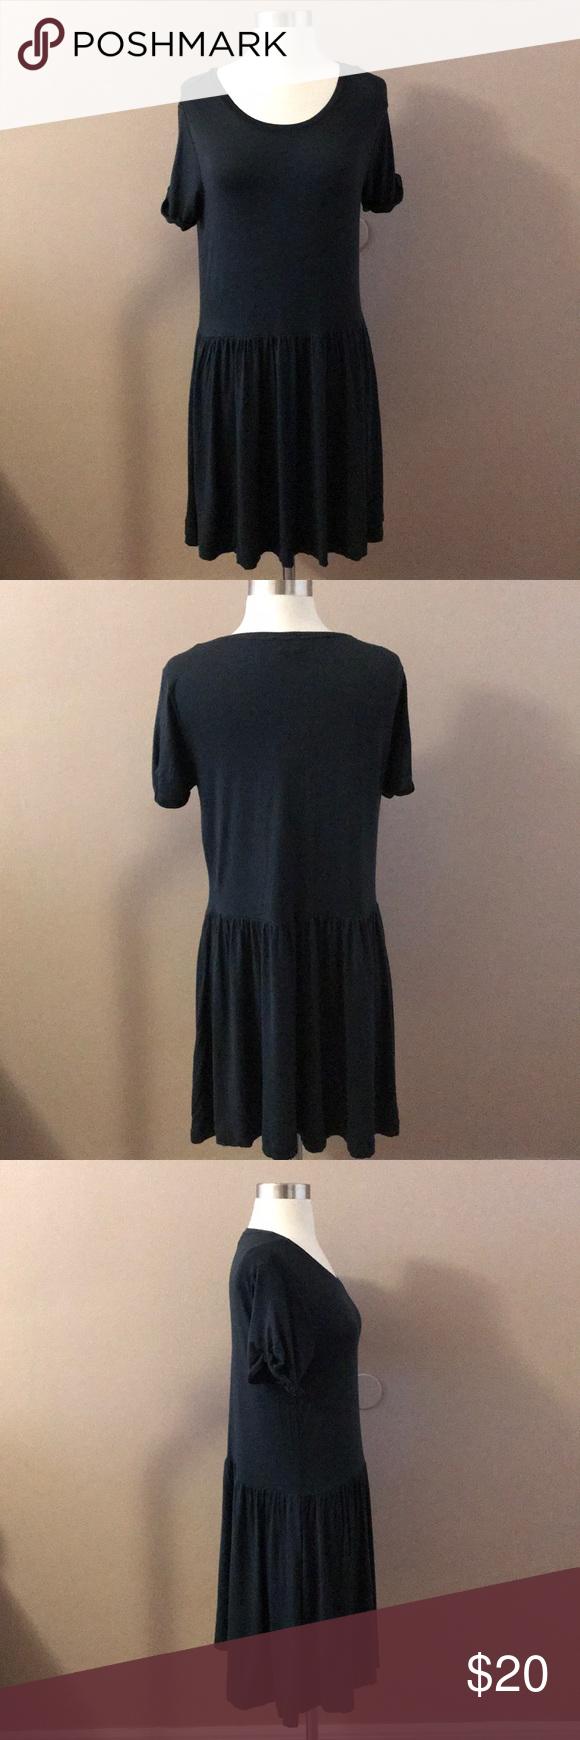 Zara modal skirted tee shirt dress zara dresses short sleeve